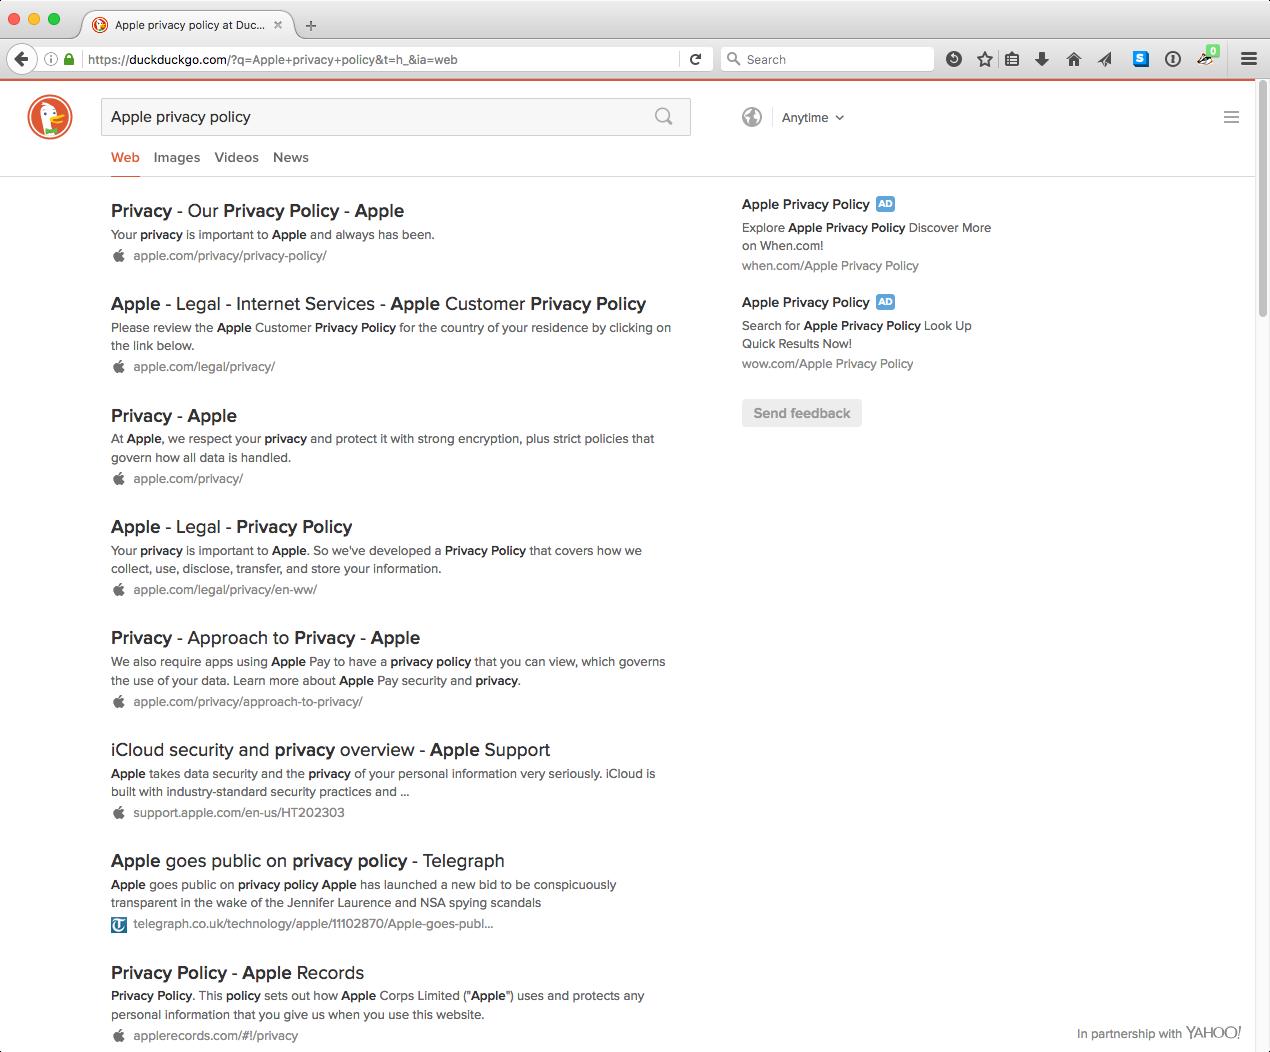 duckduckgo-search-results